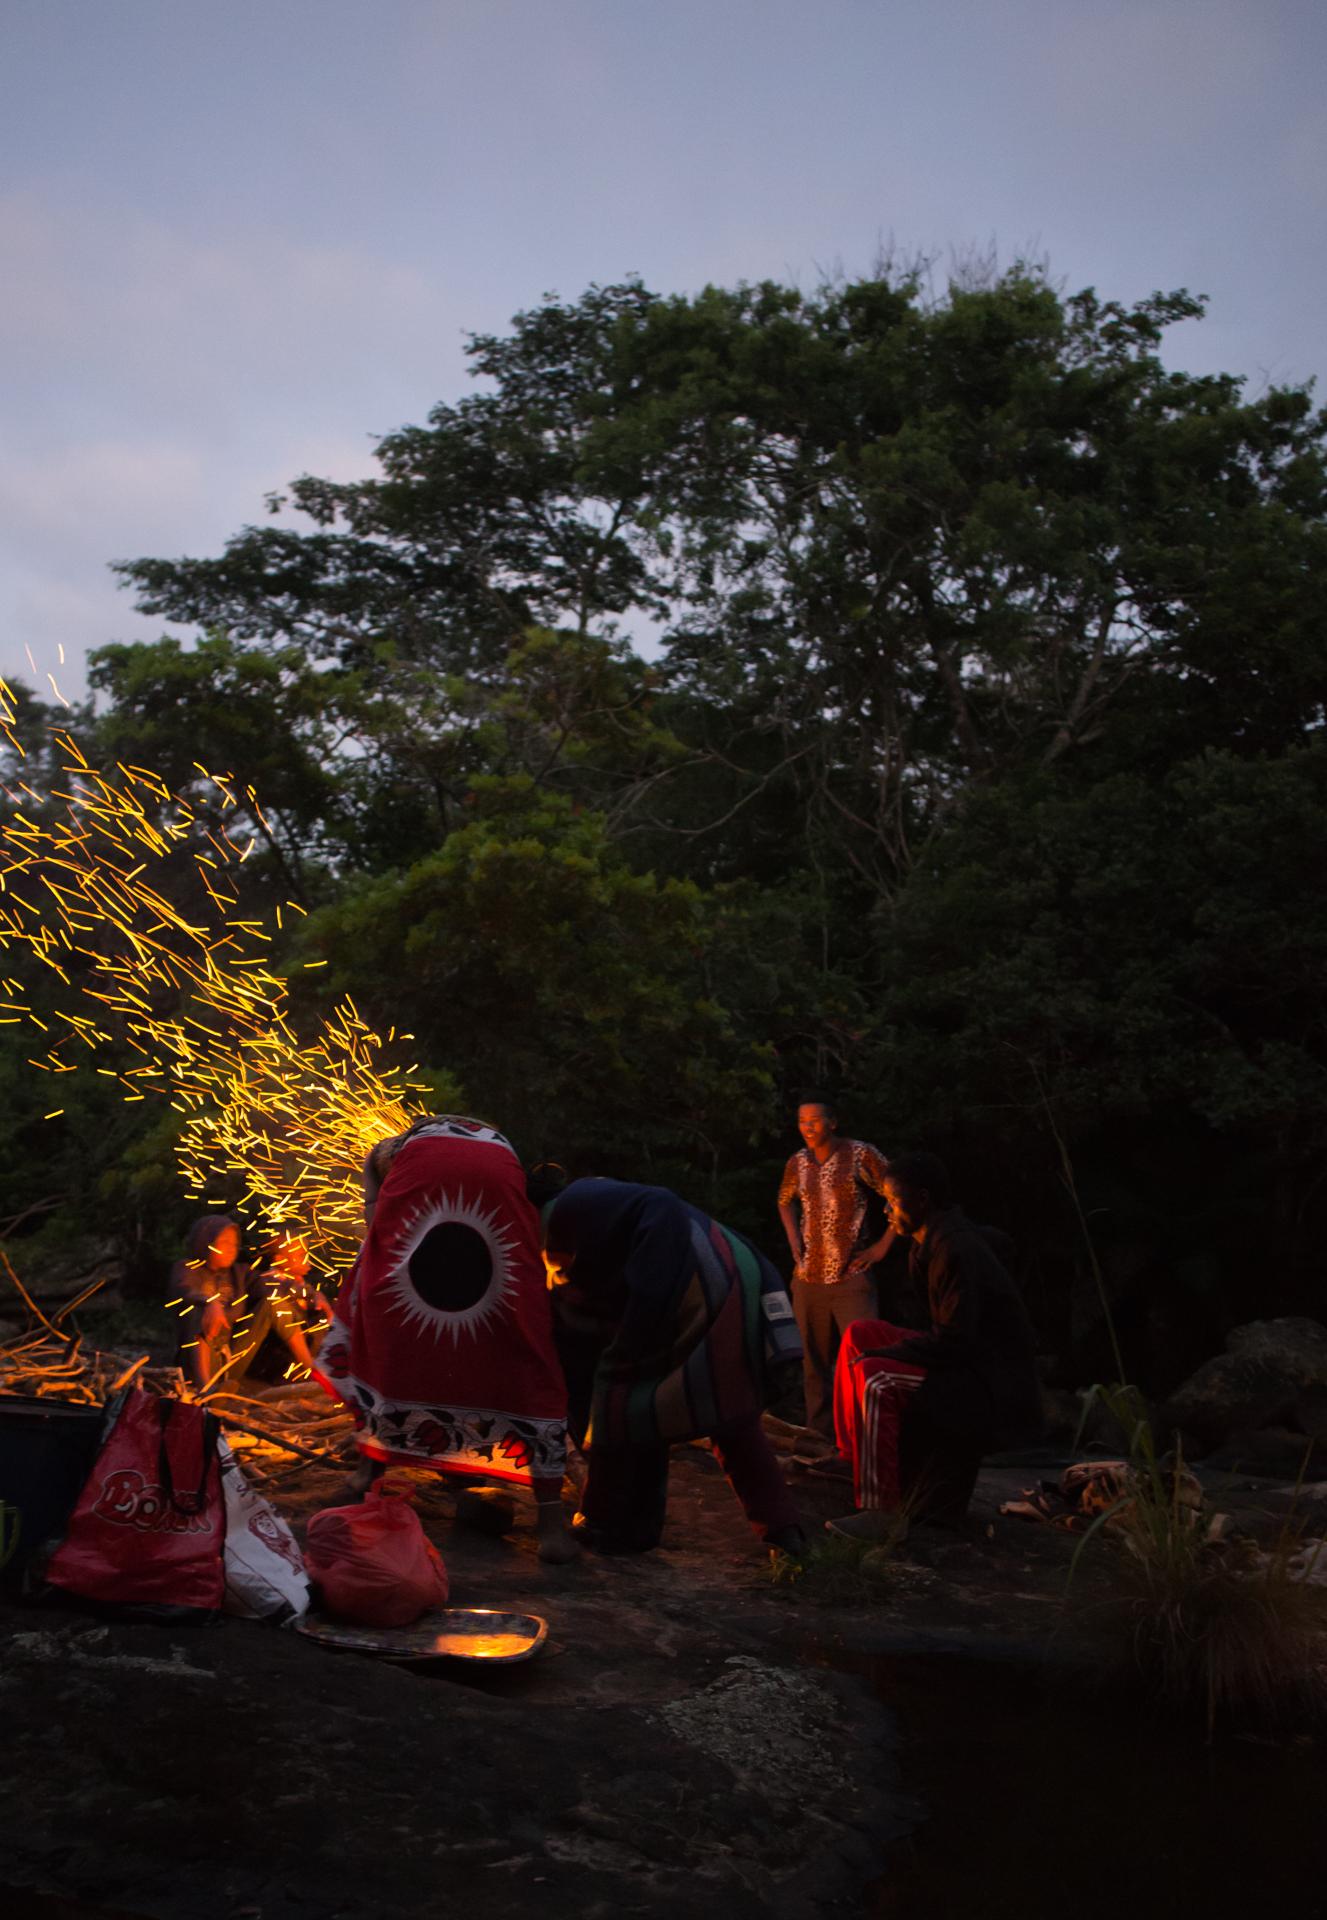 Bonfire of celebration